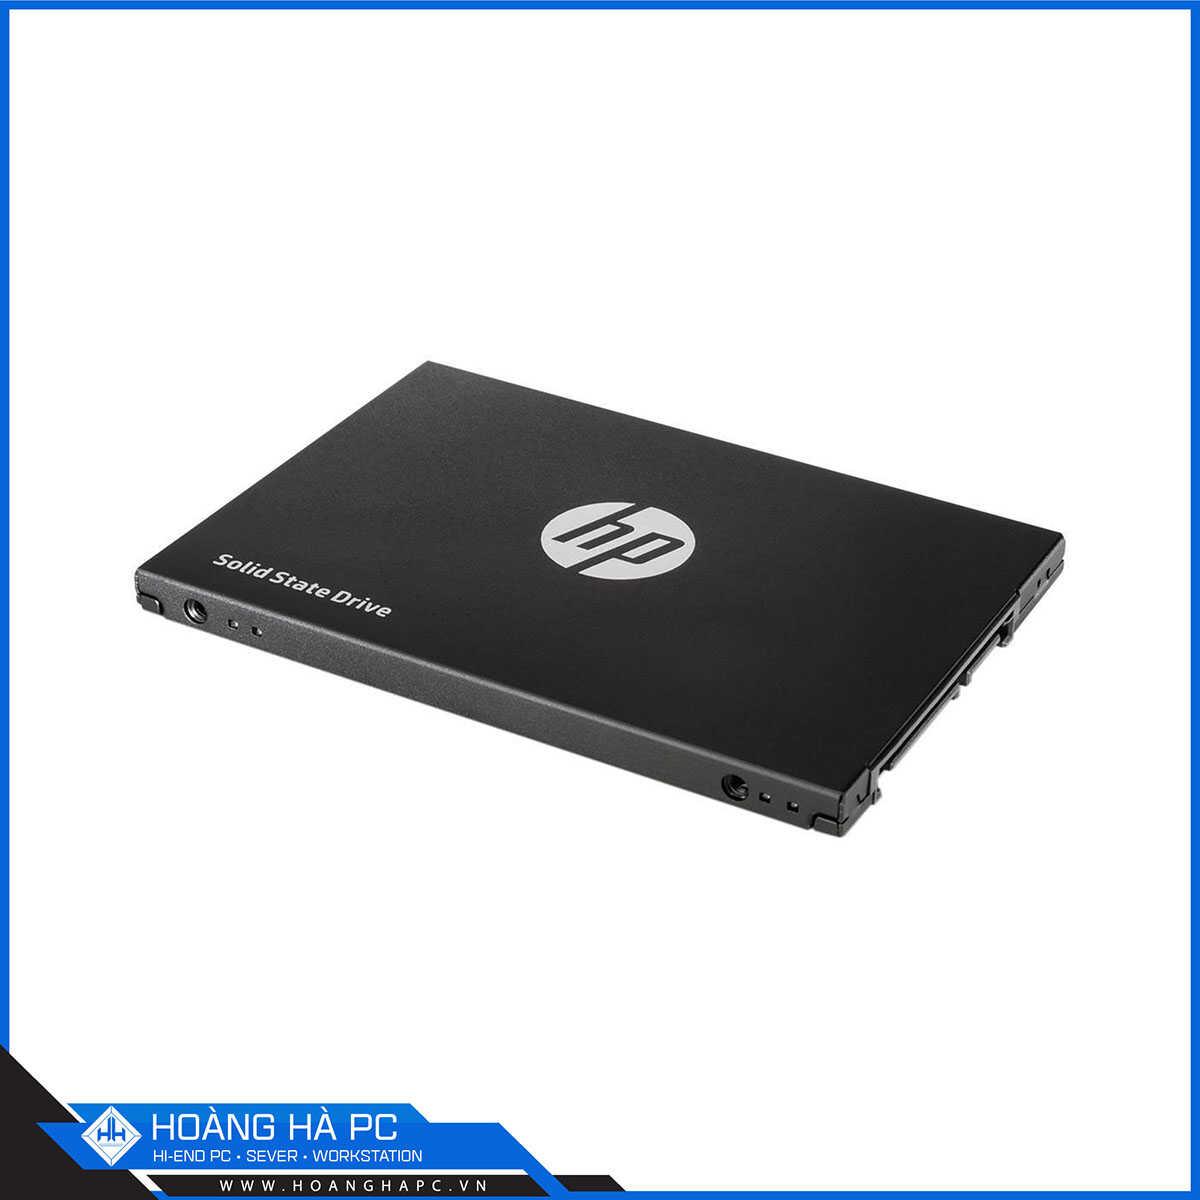 Ổ Cứng HP M700 120GB 2.5 inch Sata III